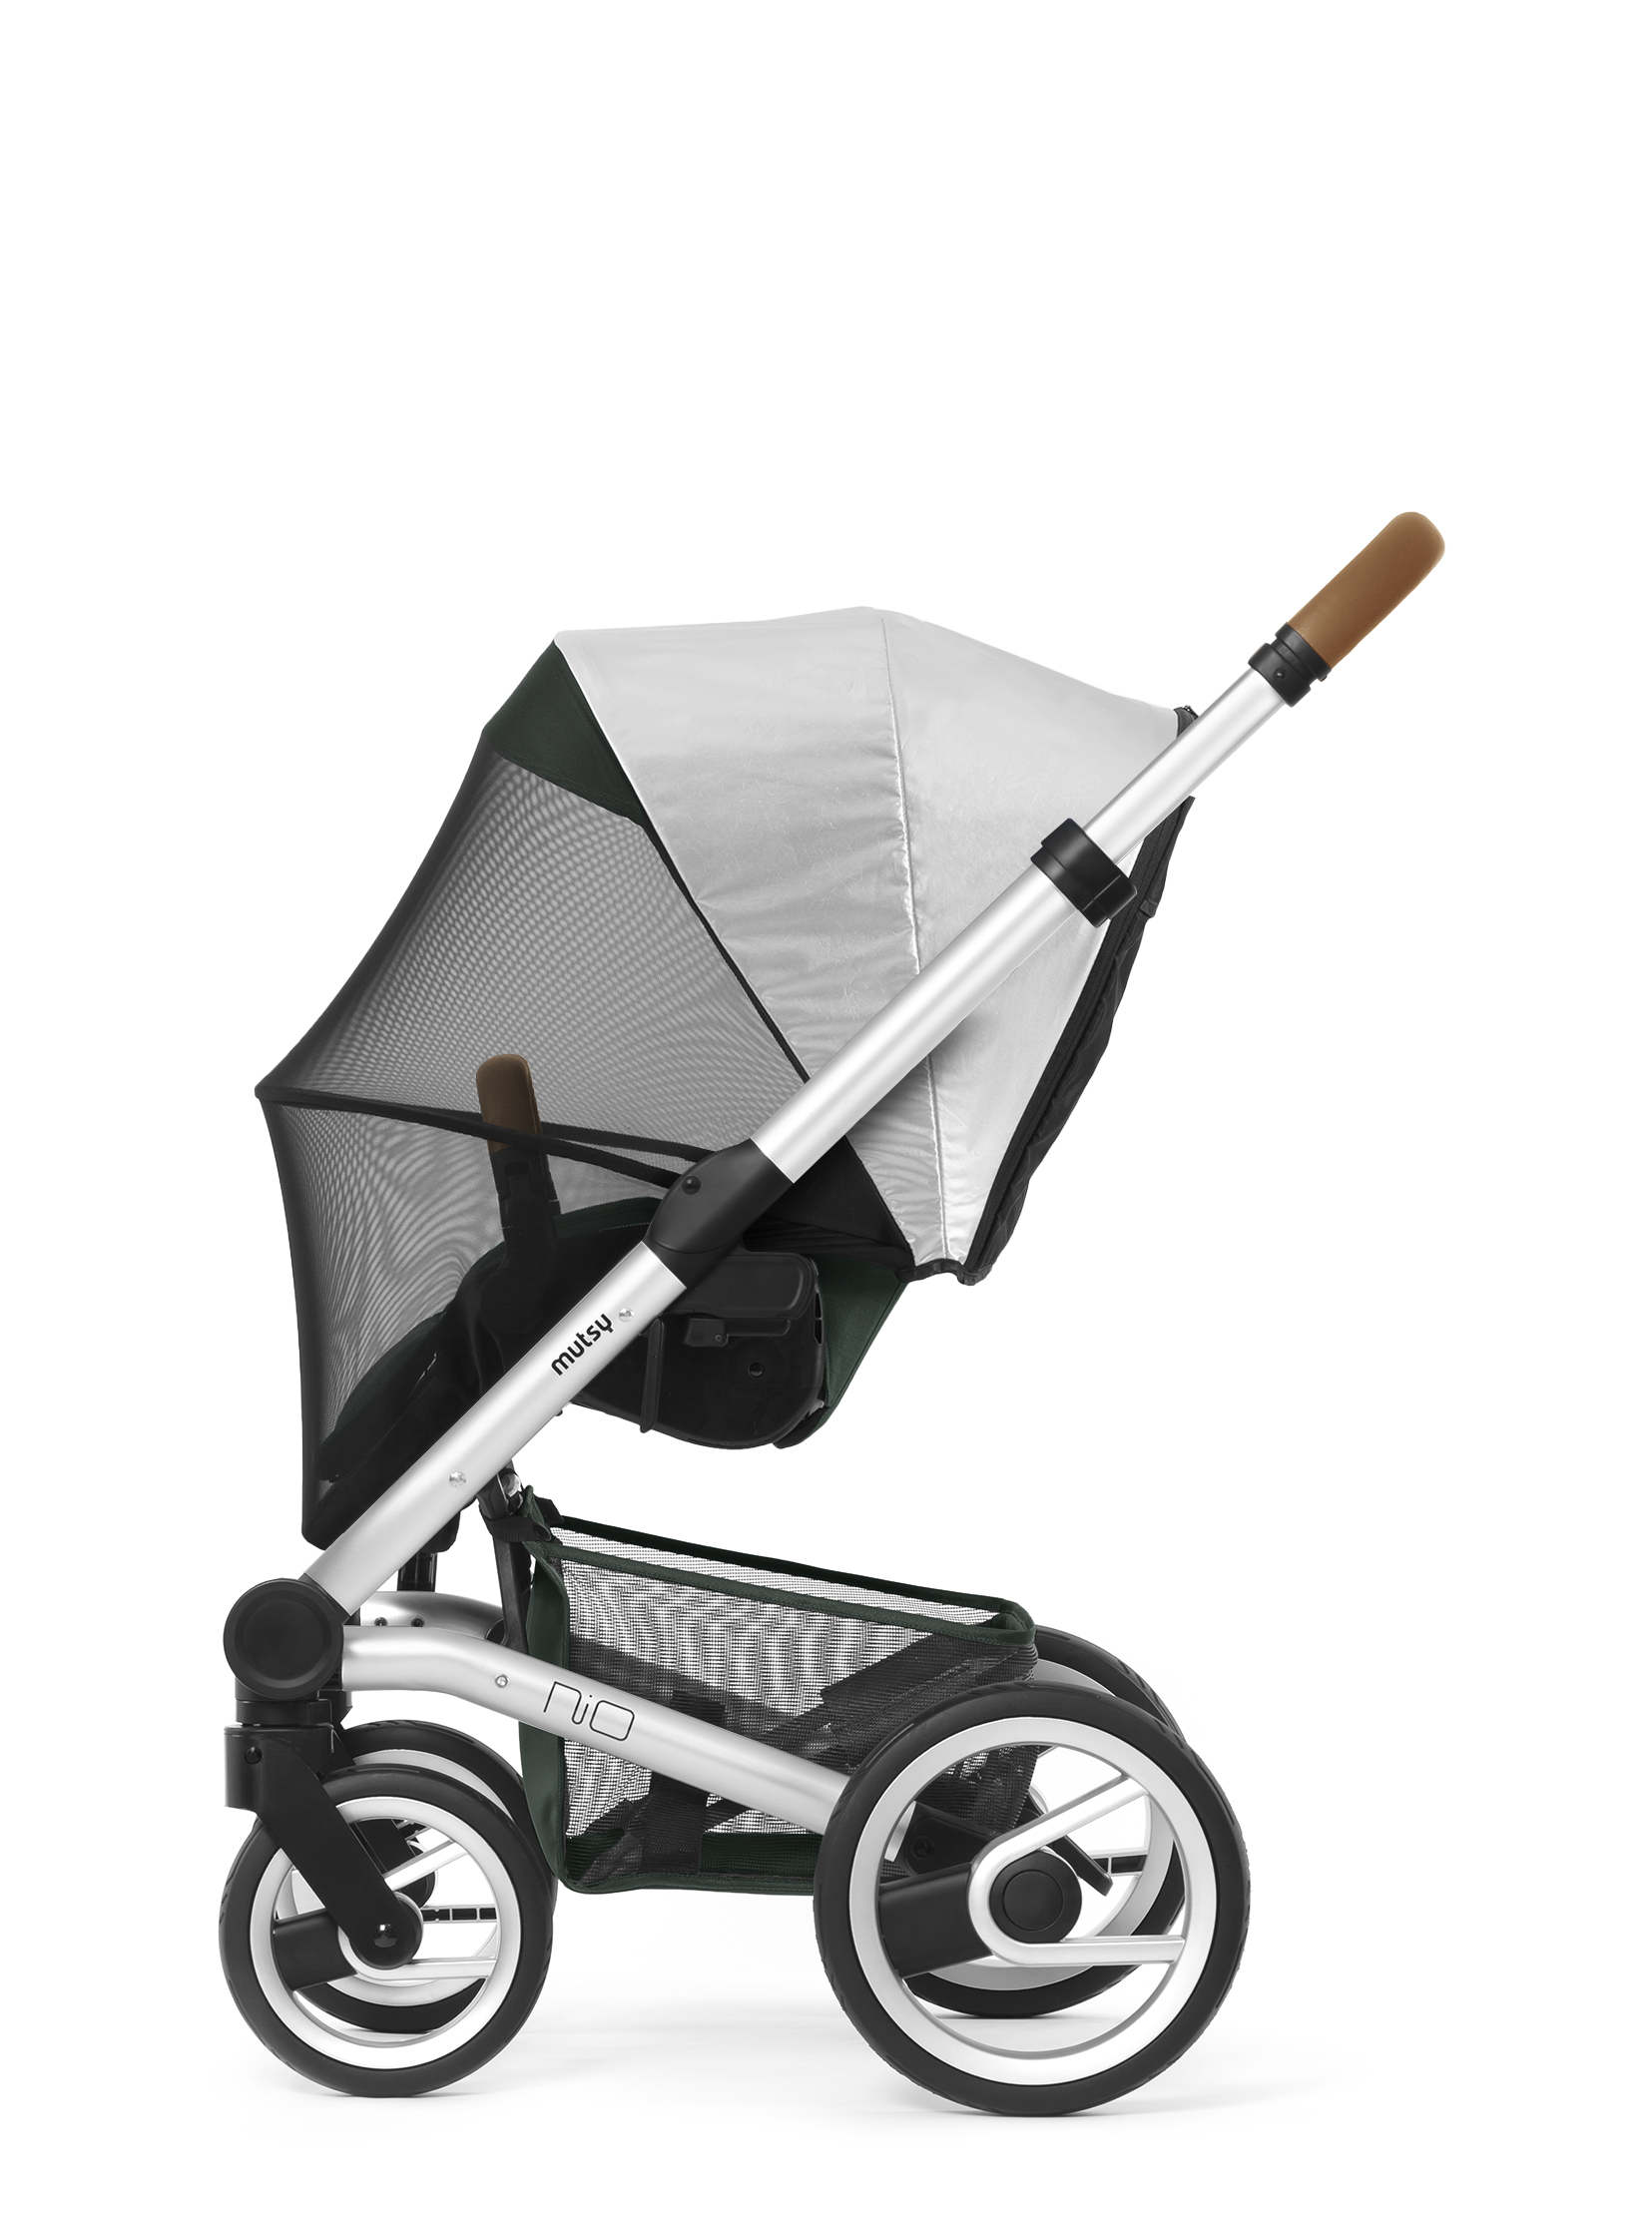 mutsy nio kinderwagenset 5in1 kinderwagen stroller baby. Black Bedroom Furniture Sets. Home Design Ideas